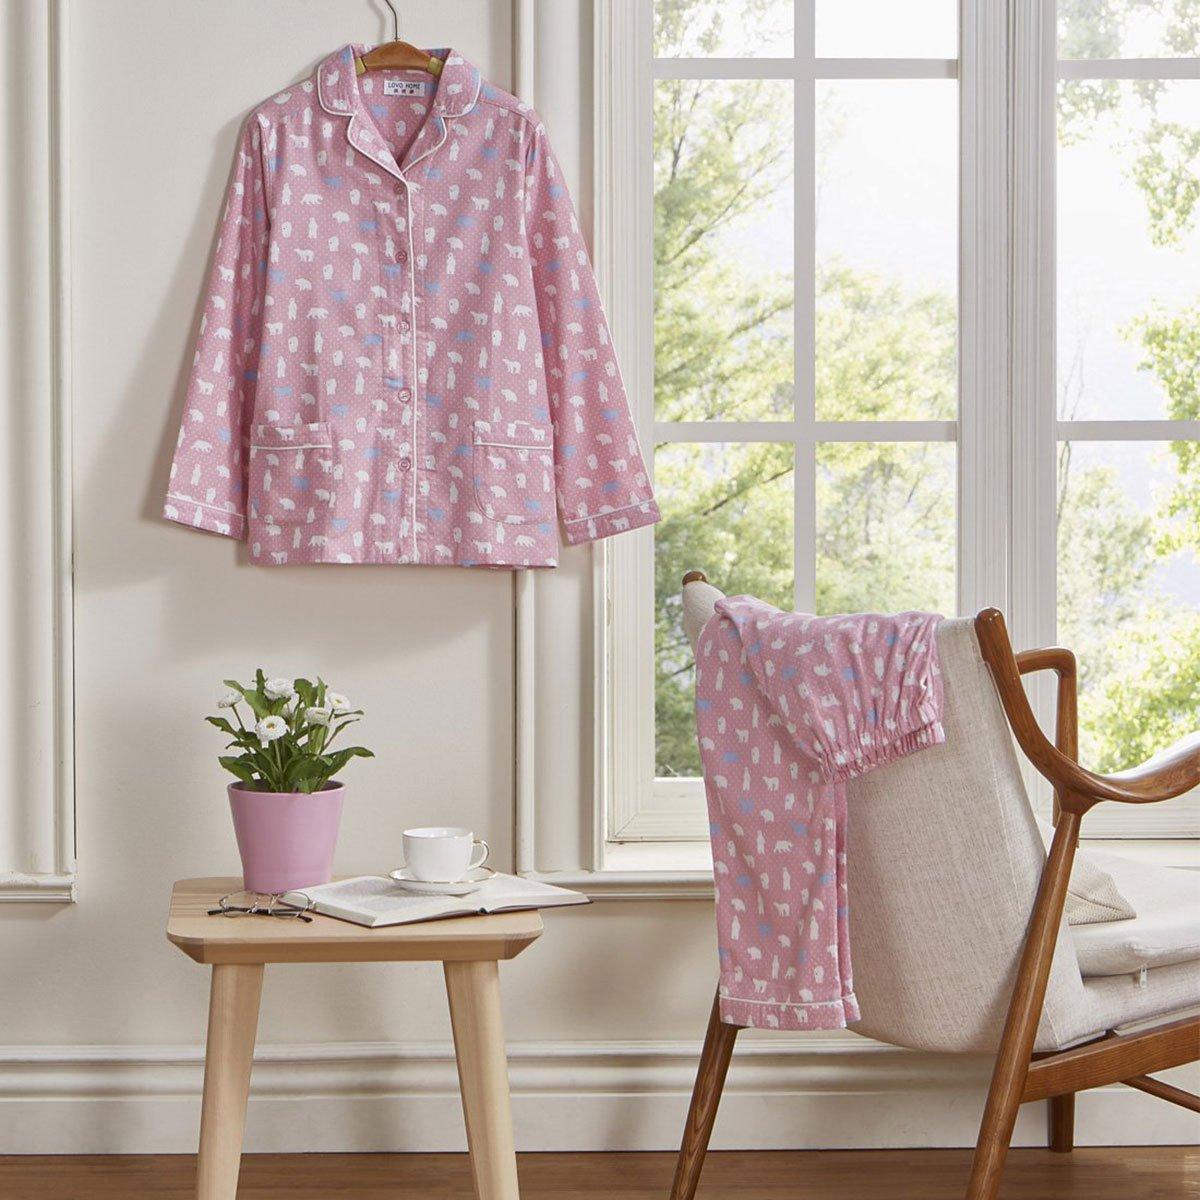 home 绒布小熊满印长袖女式睡衣家居服套装